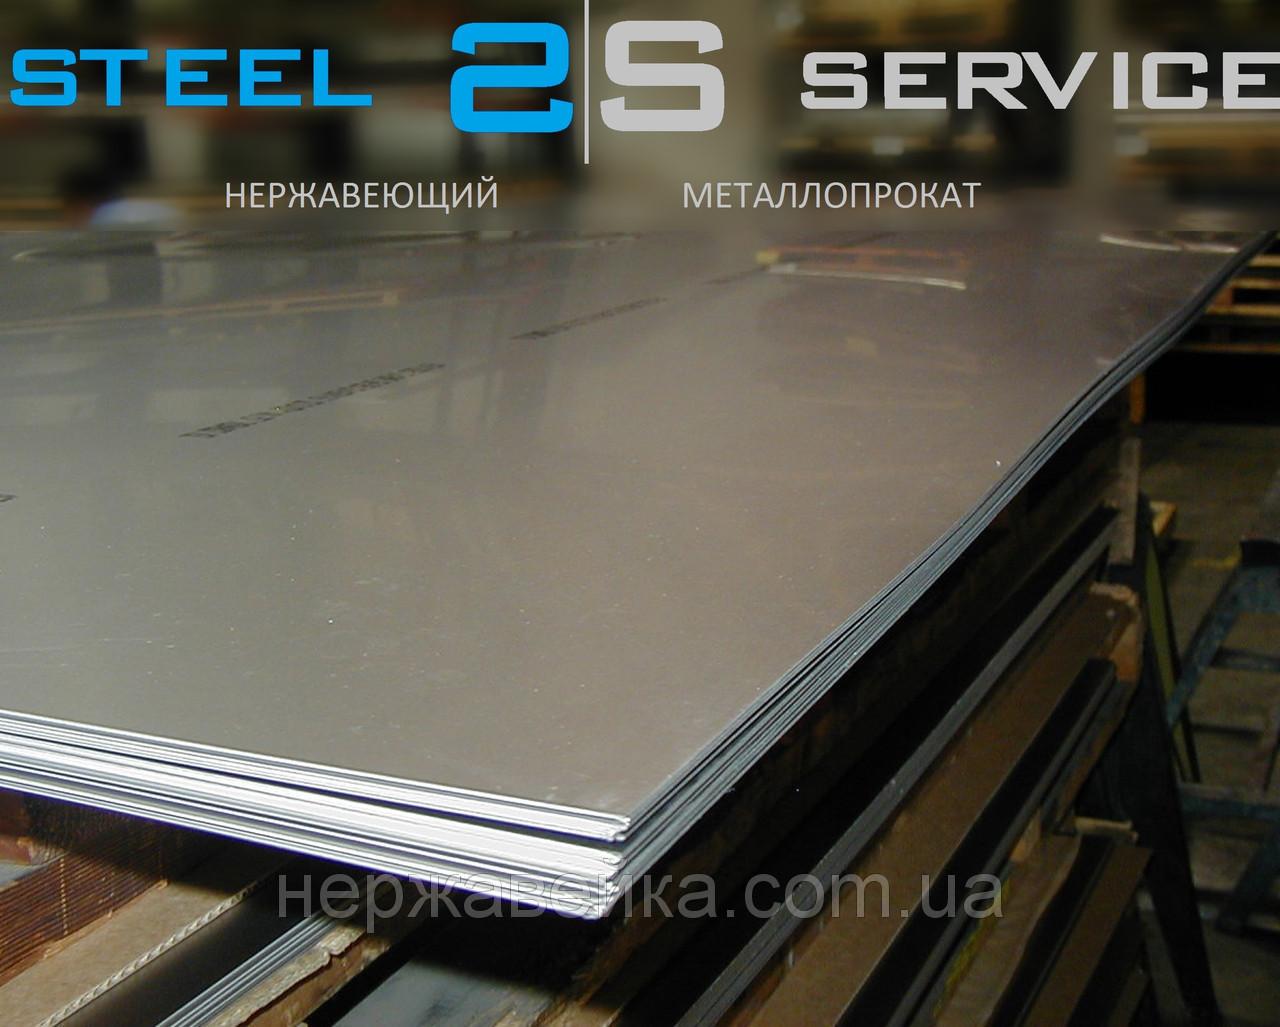 Листовая нержавейка 6х1500х6000мм AISI 430(12Х17) 2B - матовый, технический